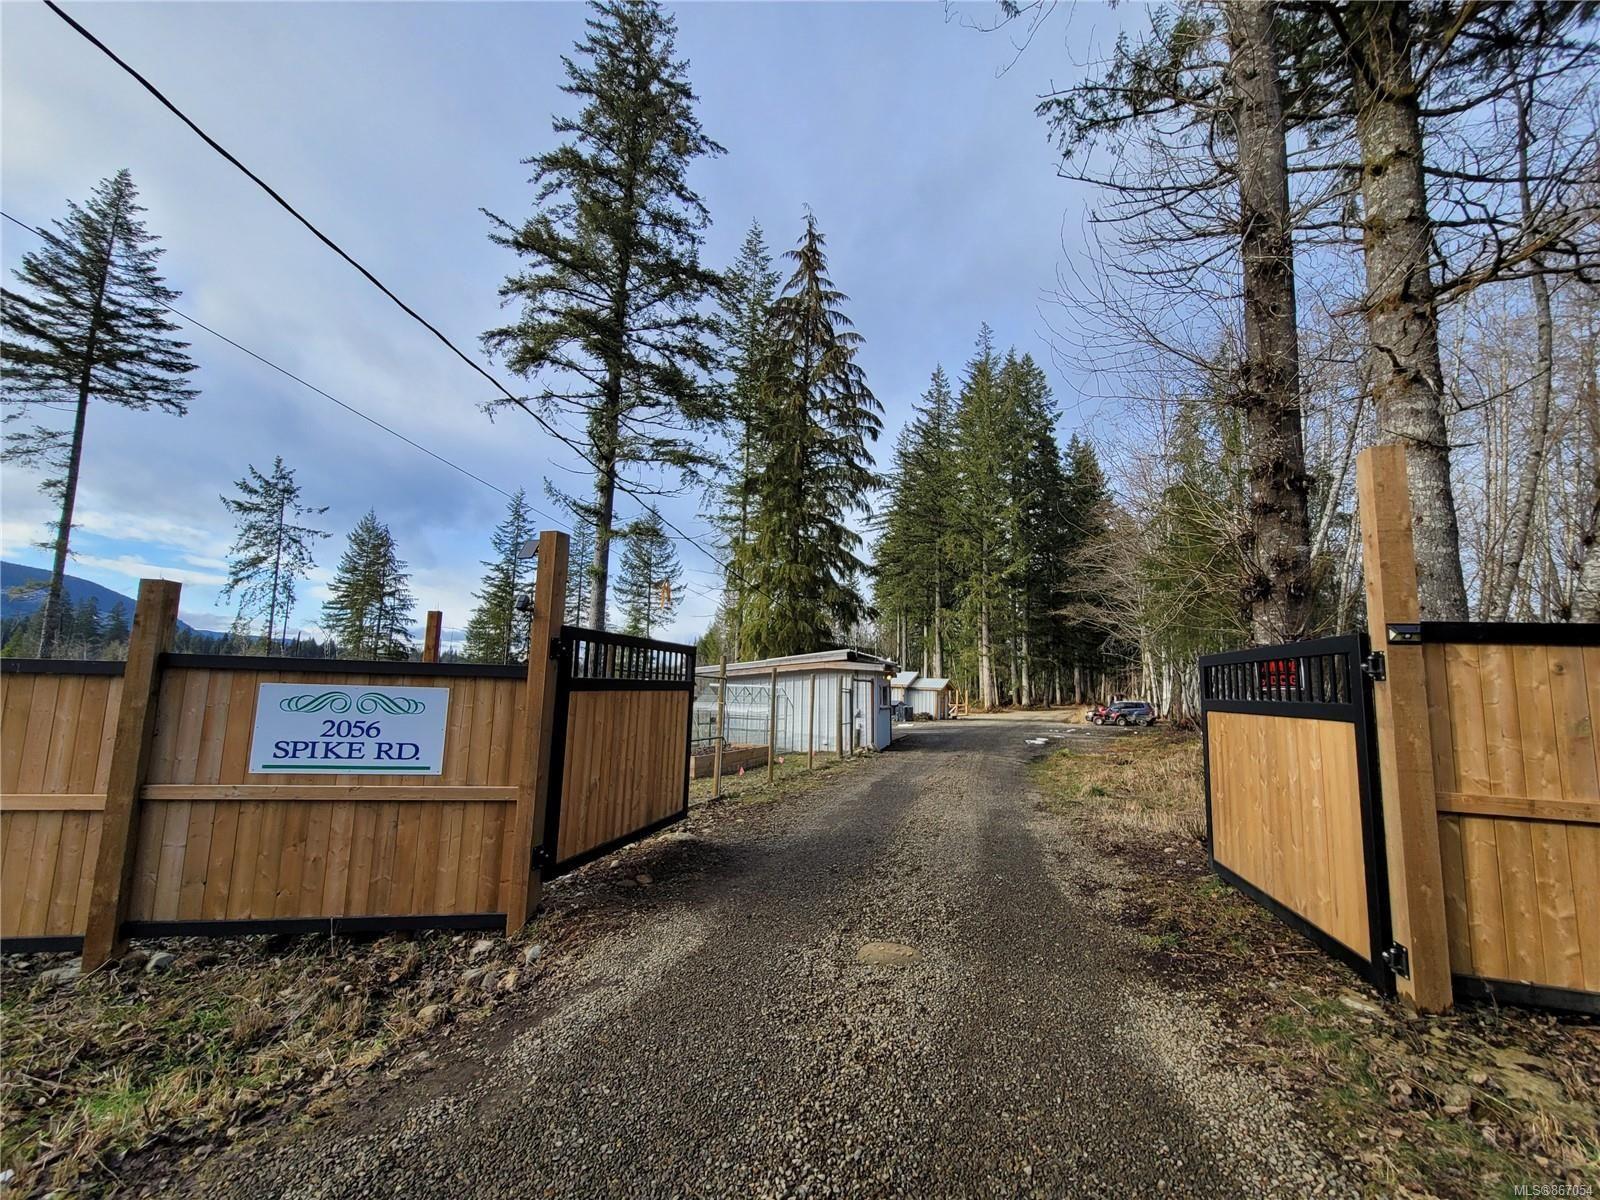 Photo 6: Photos: 2056 Spike Rd in : CV Merville Black Creek House for sale (Comox Valley)  : MLS®# 867054